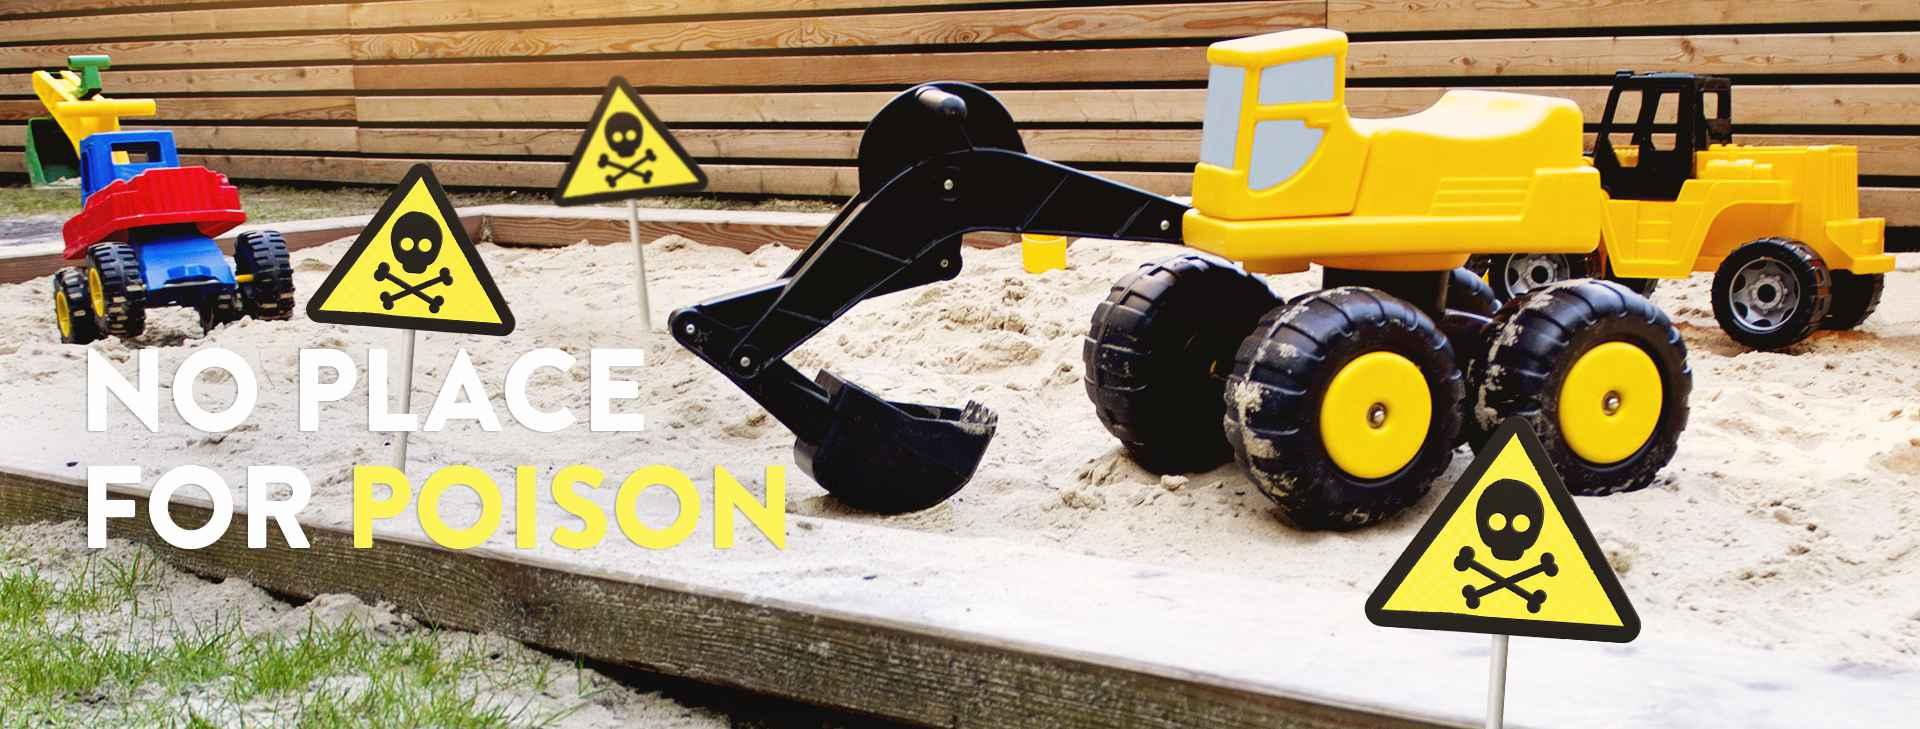 iStock-518496368-Web Sandpit